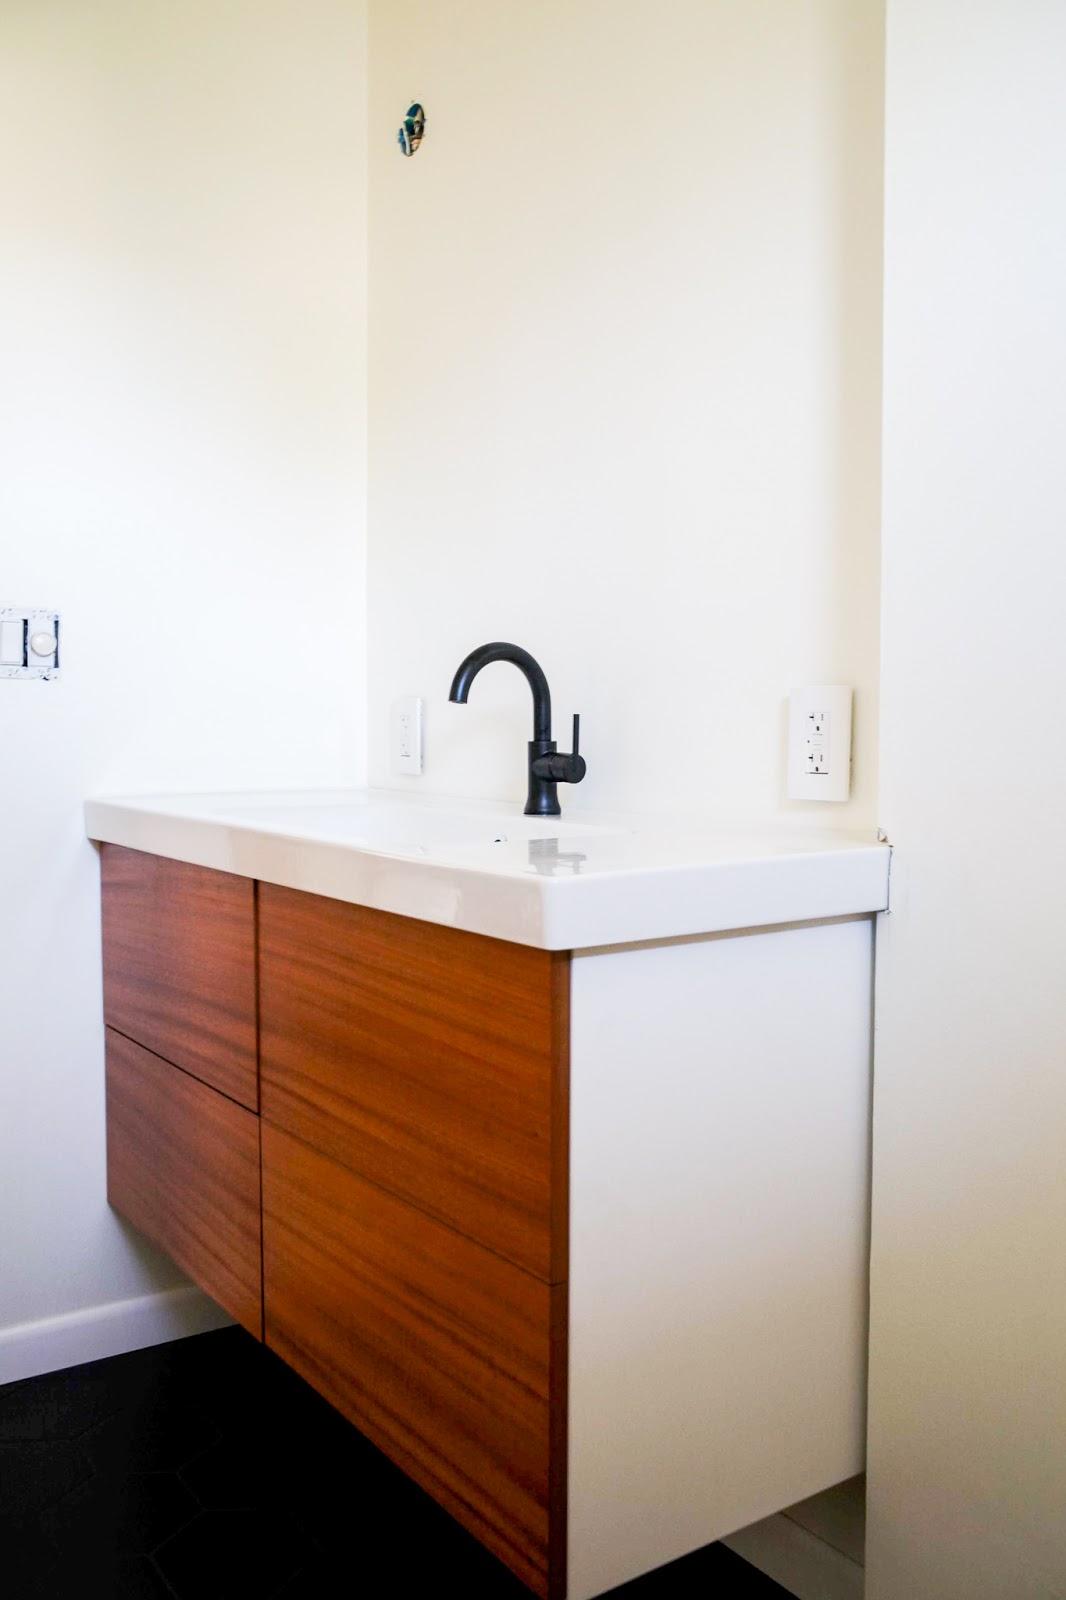 Custom Look Vanity For Less With Semihandmade Doors For Ikea Cabinets Week 5 Of The One Room Challenge Create Enjoy